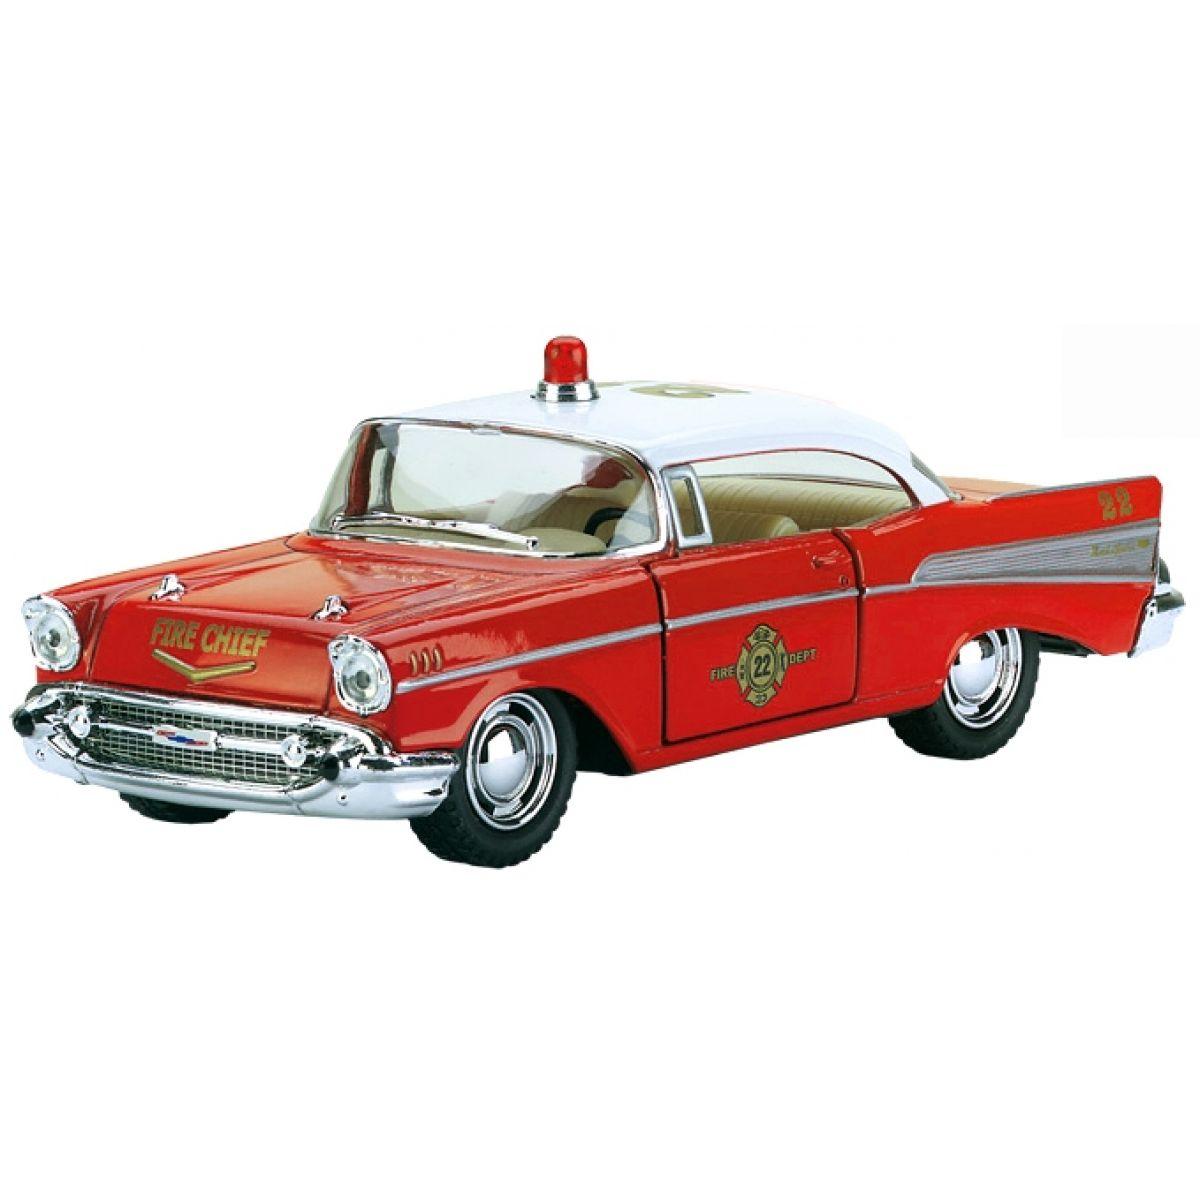 Kinsmart Auto Chevrolet 1957 Fire Chief